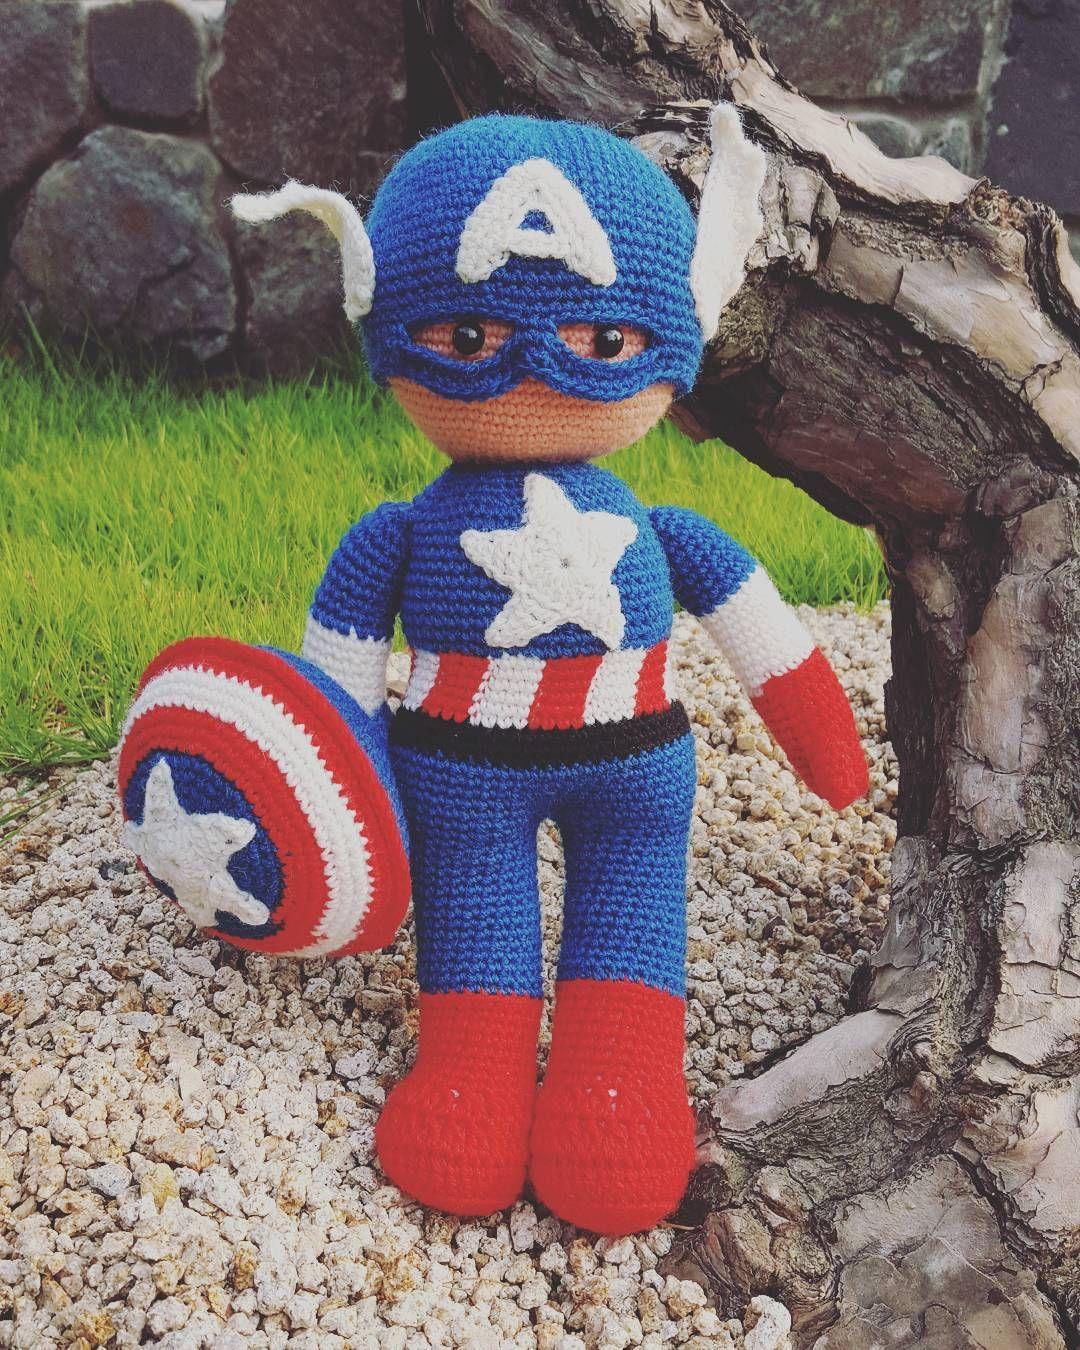 jenia_crochet_ #캡틴아메리카 완성  #일상 #일상스타그램 #코바늘인형 #코바늘뜨기 #뜨개질그램 #손뜨개그램 #손뜨개 #코바늘뜨기 #크로쉐그램 #크로쉐 #crochet #crochetlover #handmade #instacrochet #ilovecrochet #crochetaddict